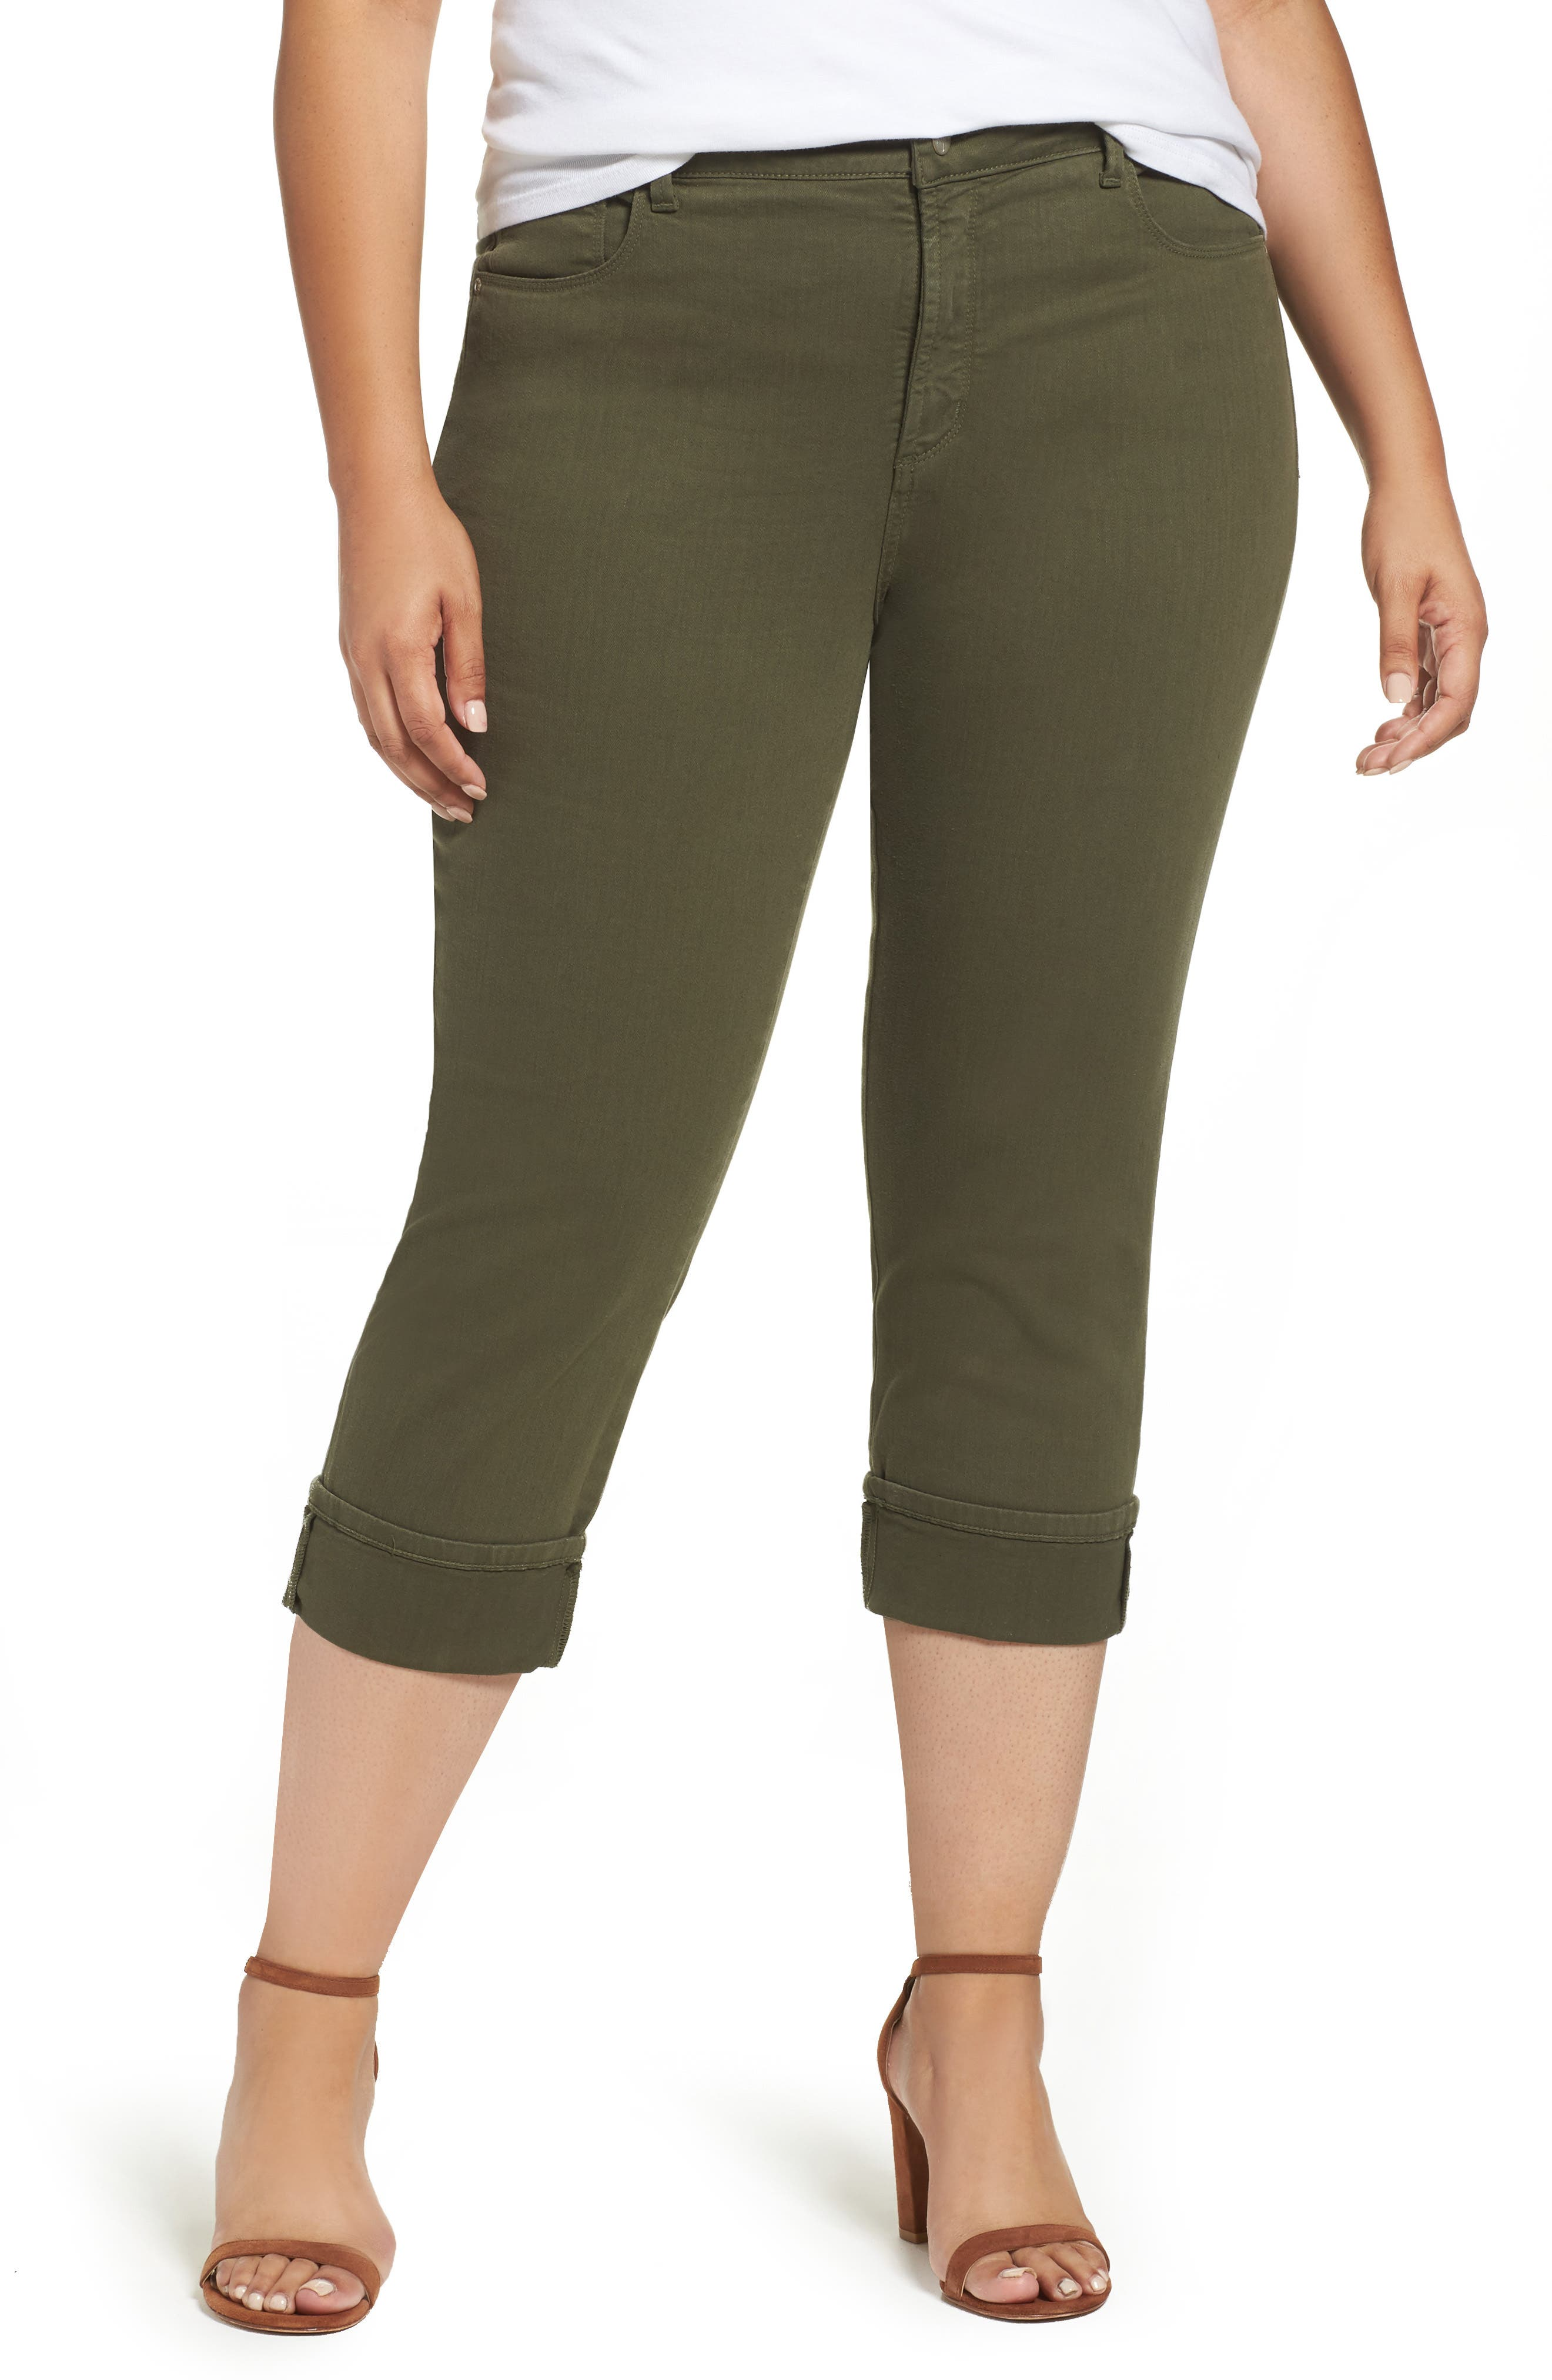 Main Image - NYDJ Dayla Colored Wide Cuff Capri Jeans (Plus Size)